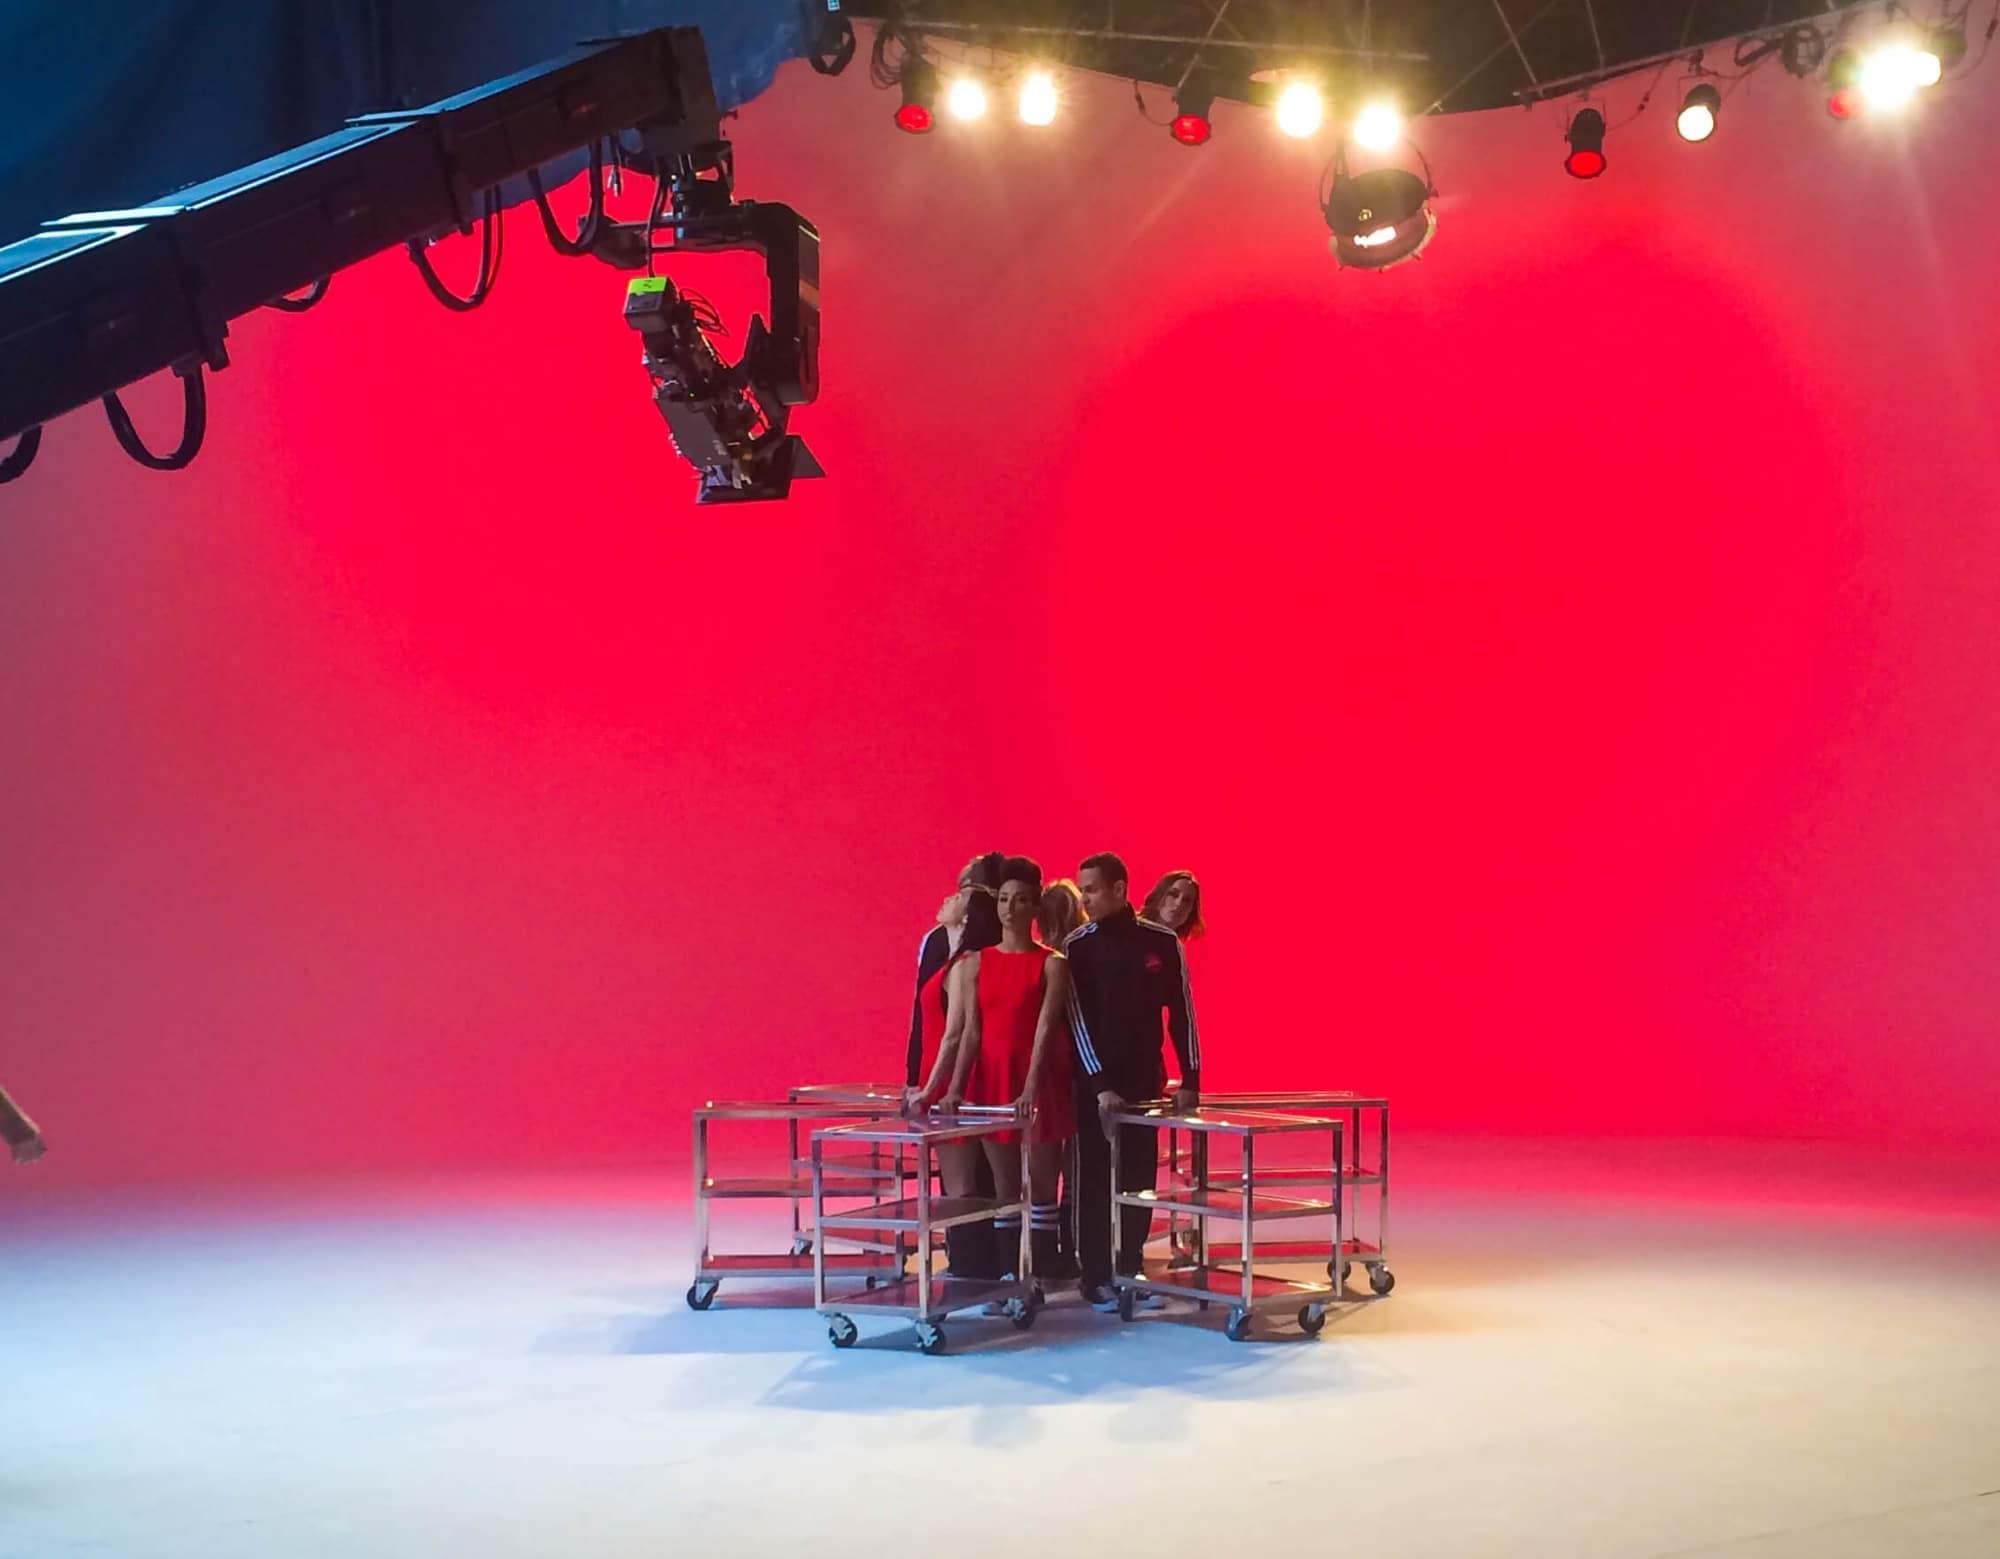 Tv-commercials-pizza-hut-asher entertainment-food-fun-set-filming-crew-cast-commercial-dancers